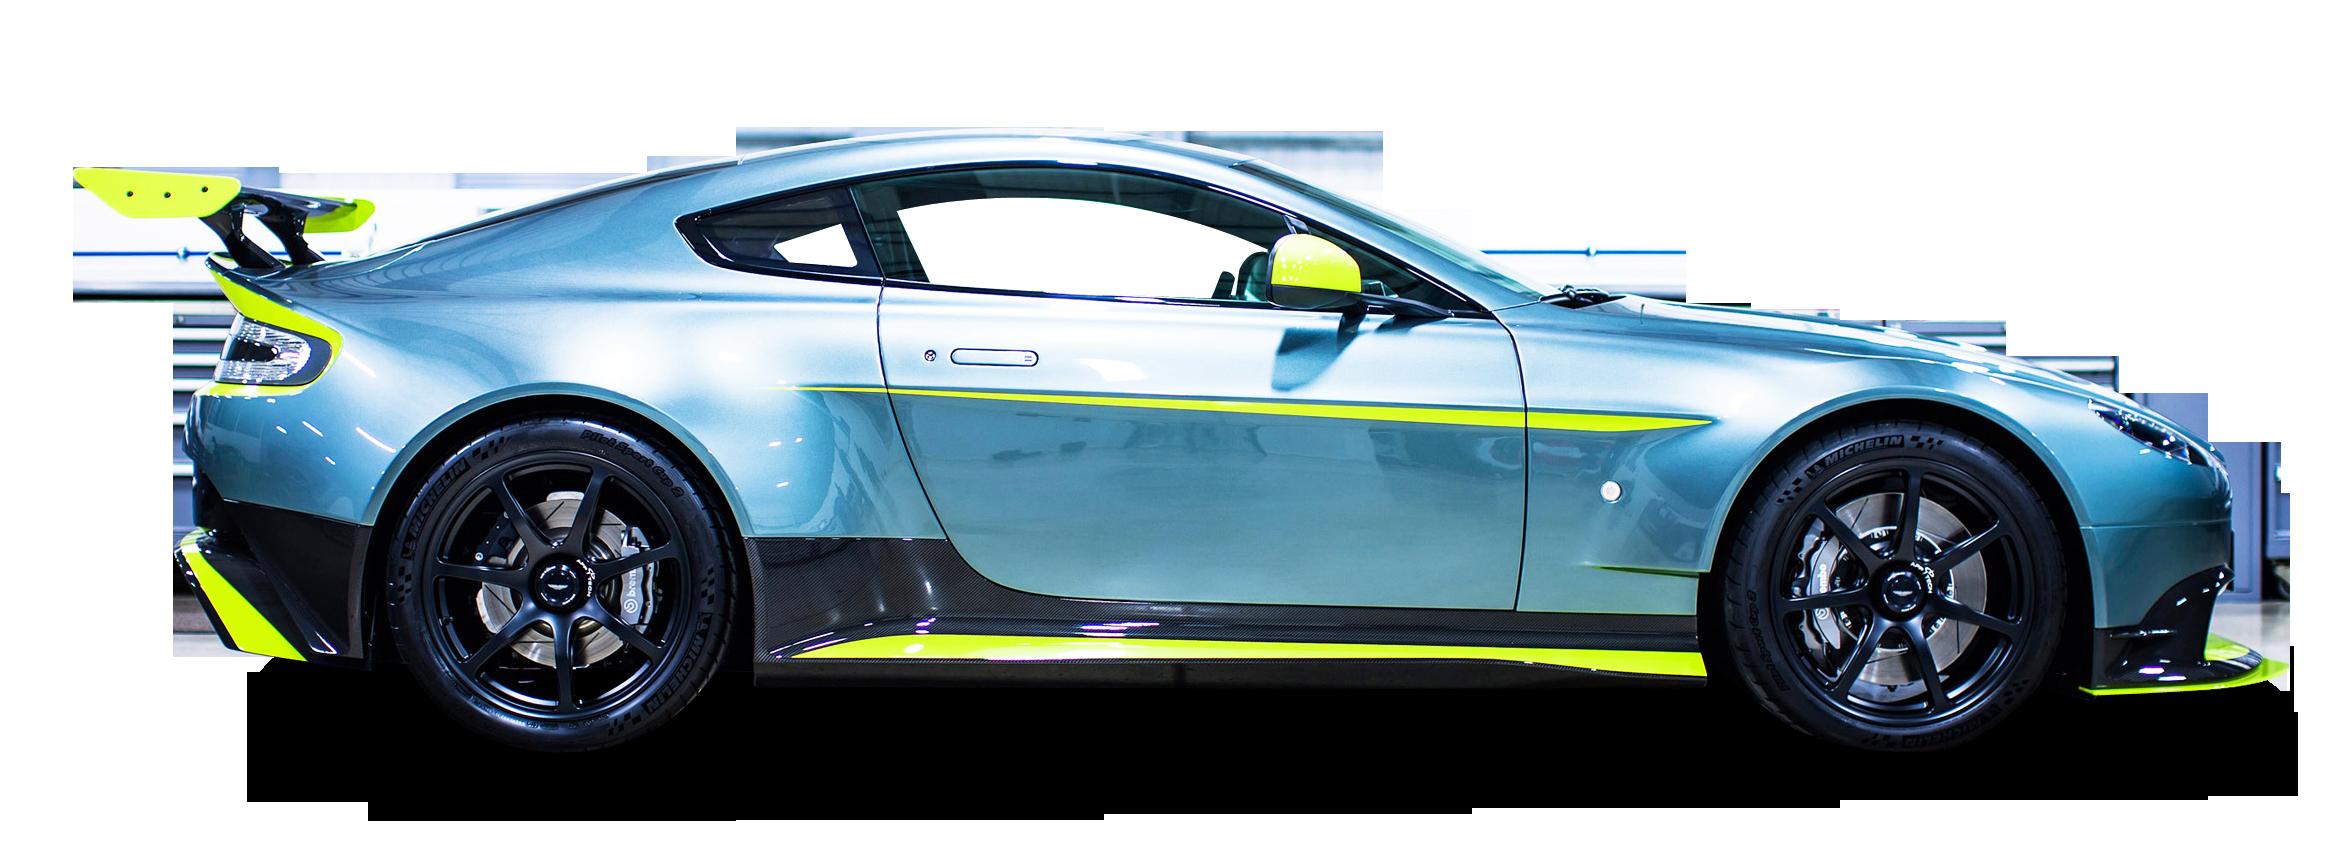 Aston Martin Vantage GT8 Car